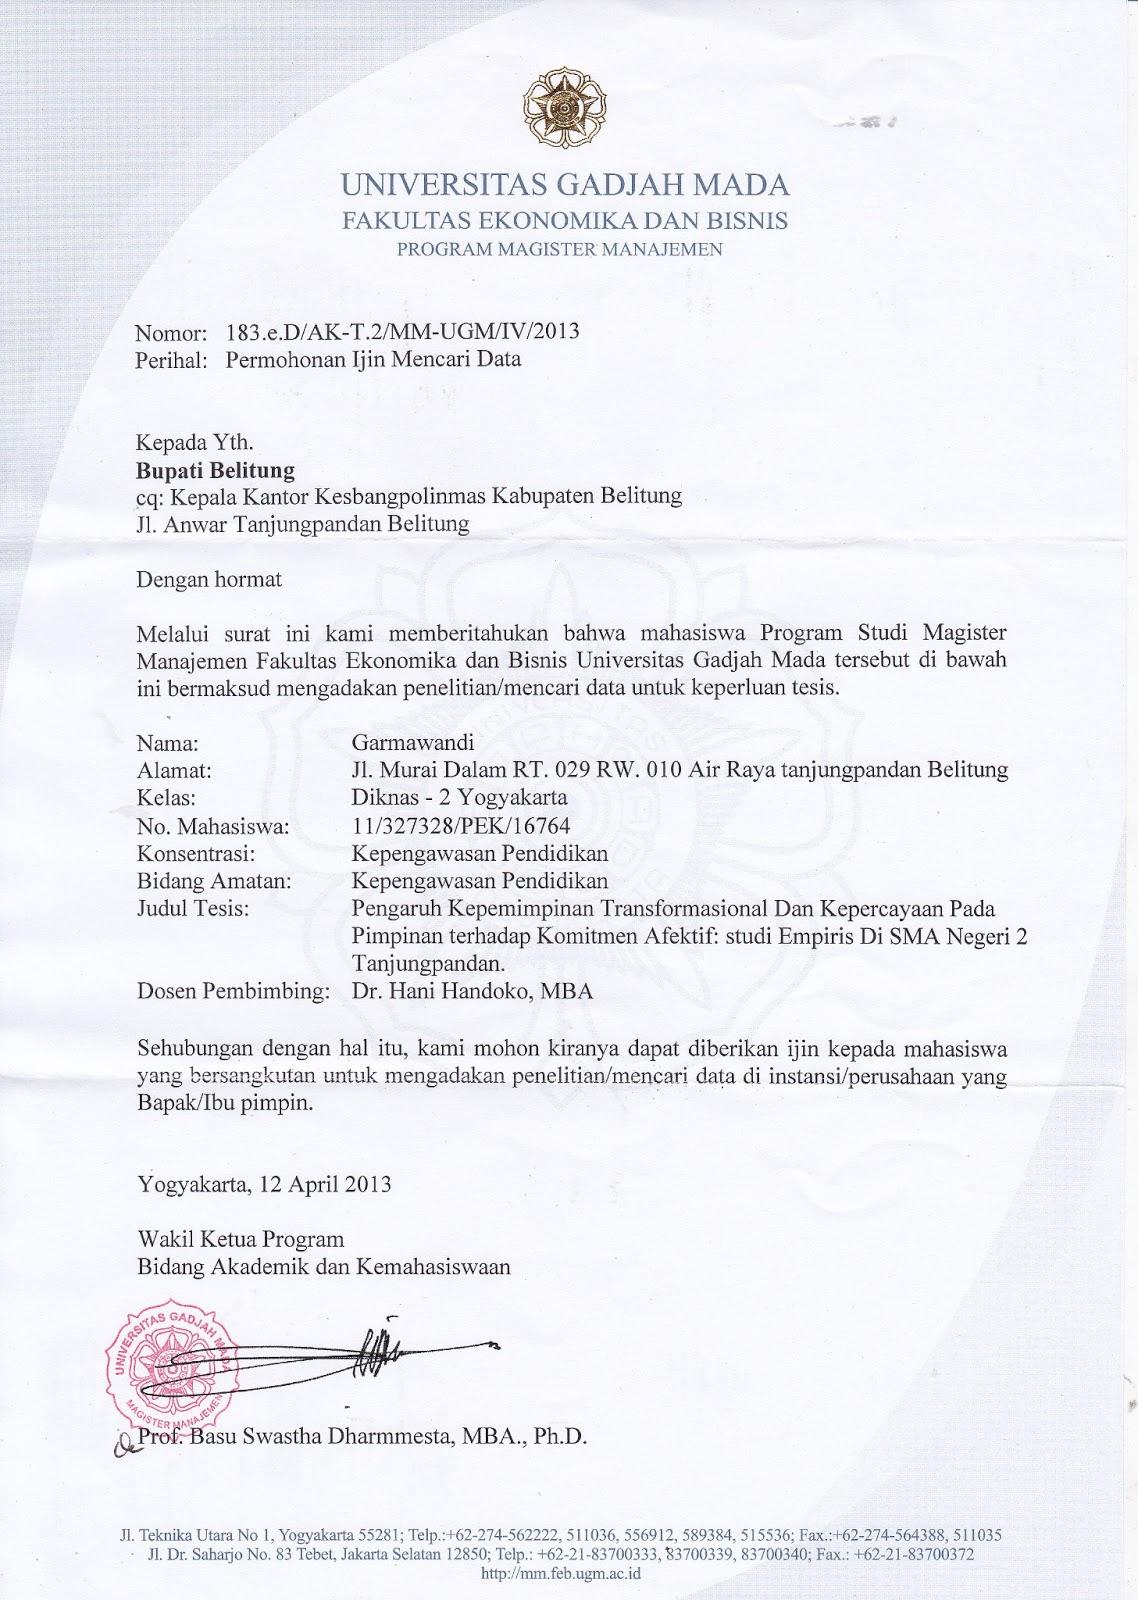 Contoh Surat Balasan Permohonan Izin Penelitian Surat W